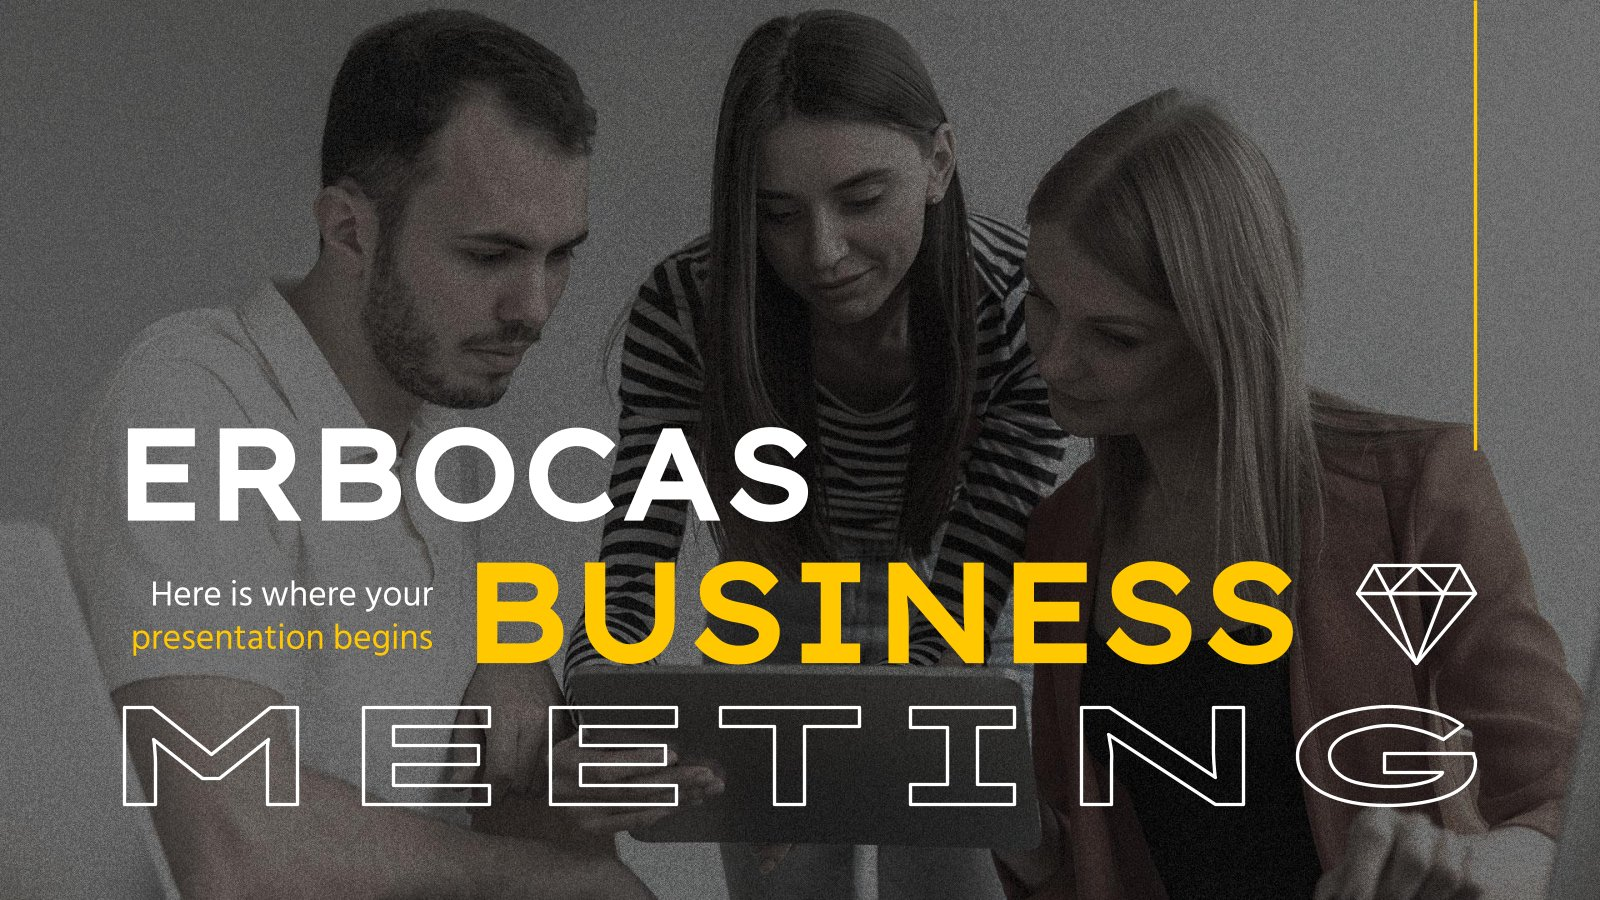 Erbocas Business Meeting presentation template